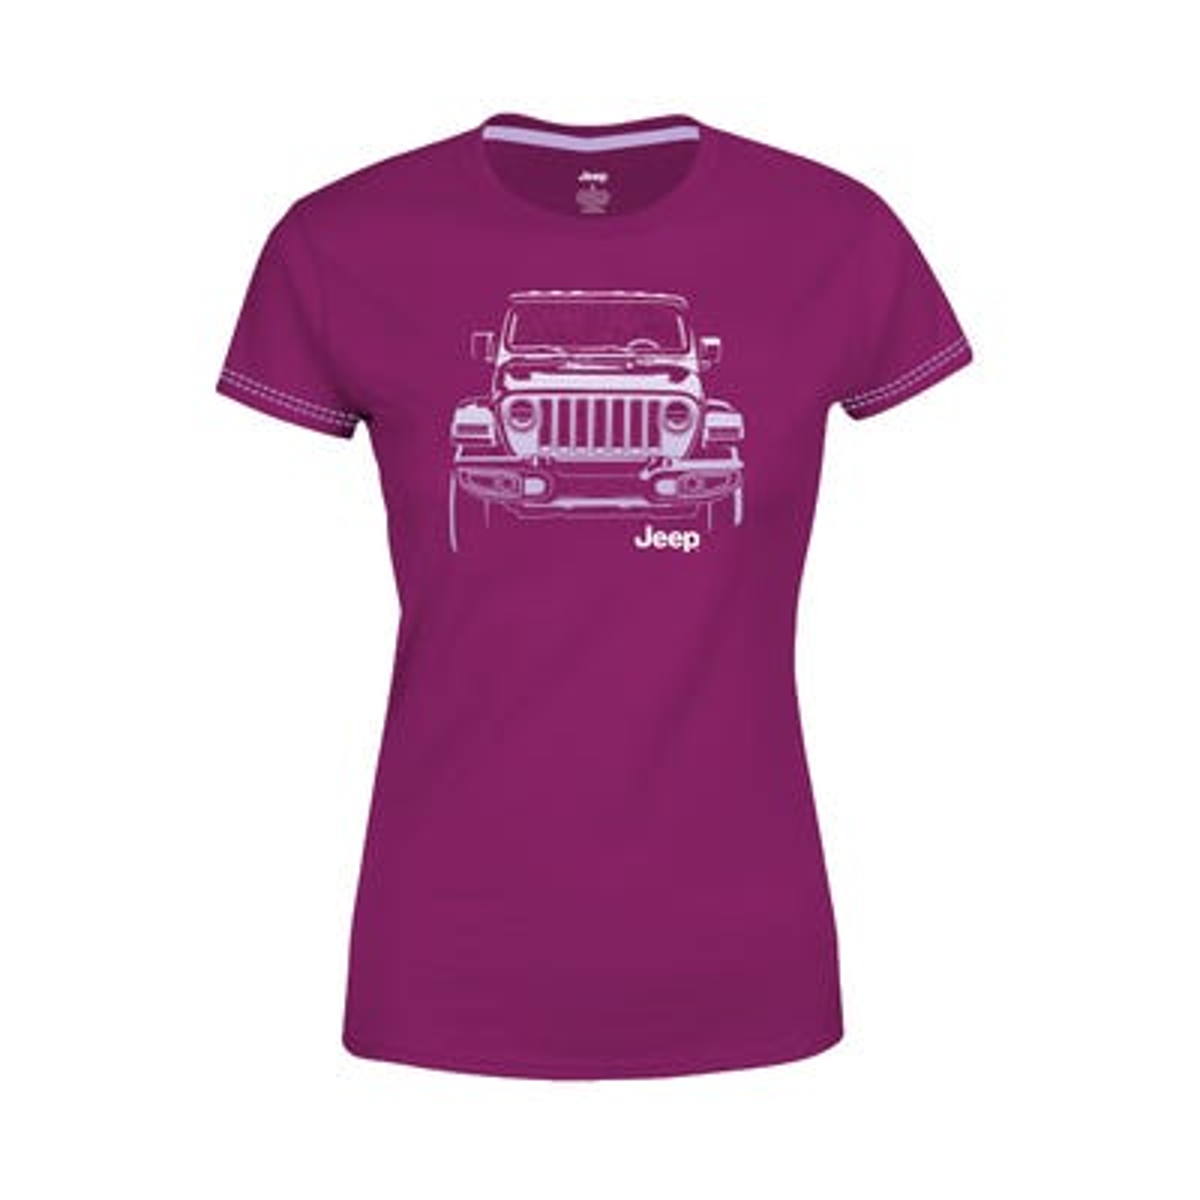 Women's Topographic Wrangler T-shirt